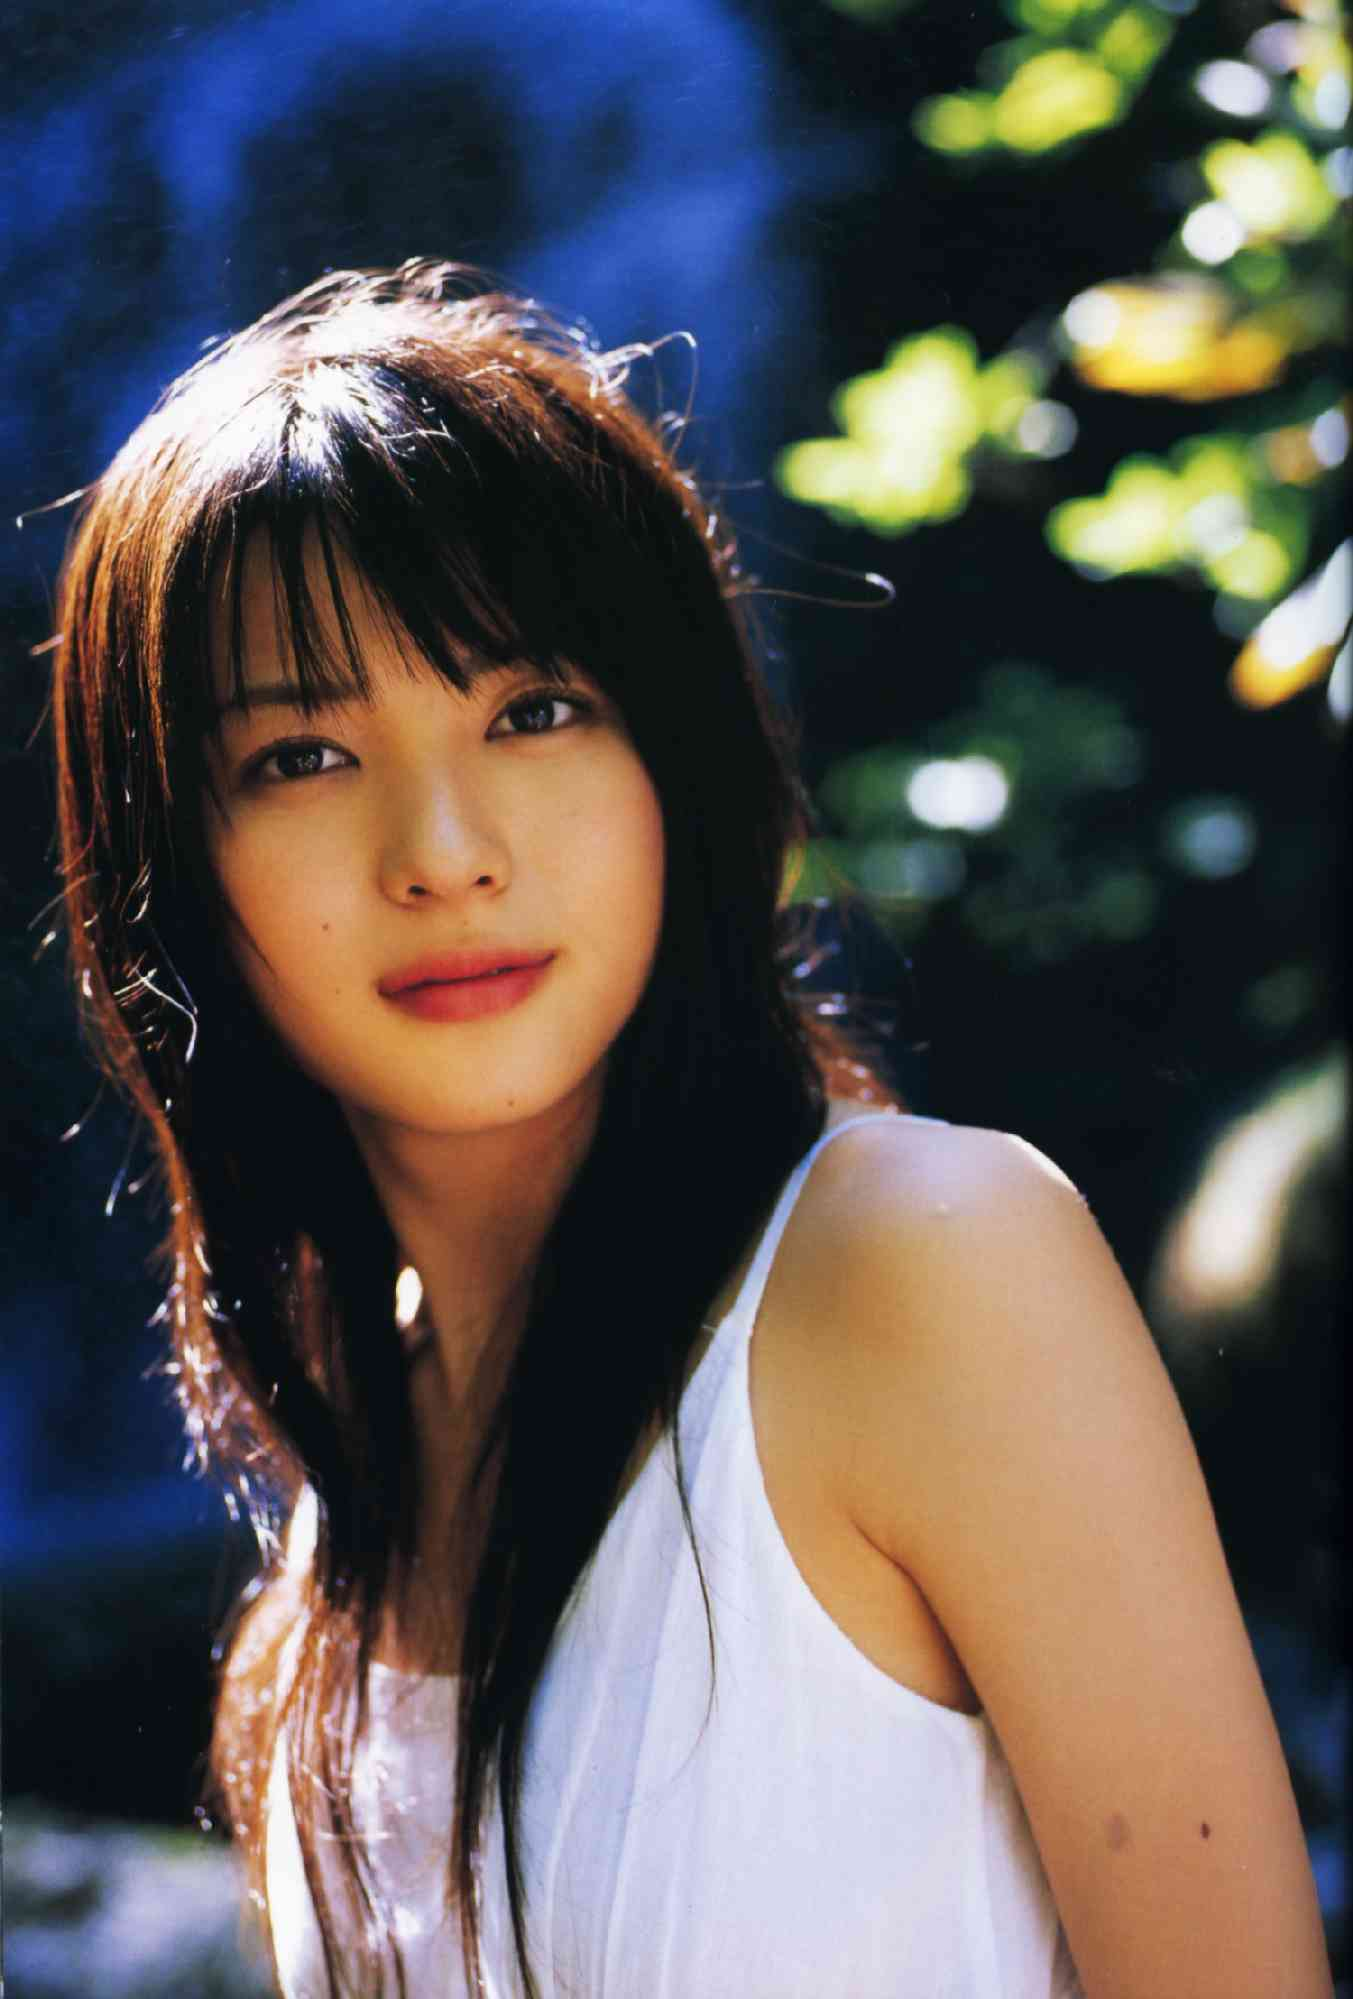 矢島舞美の画像 p1_23